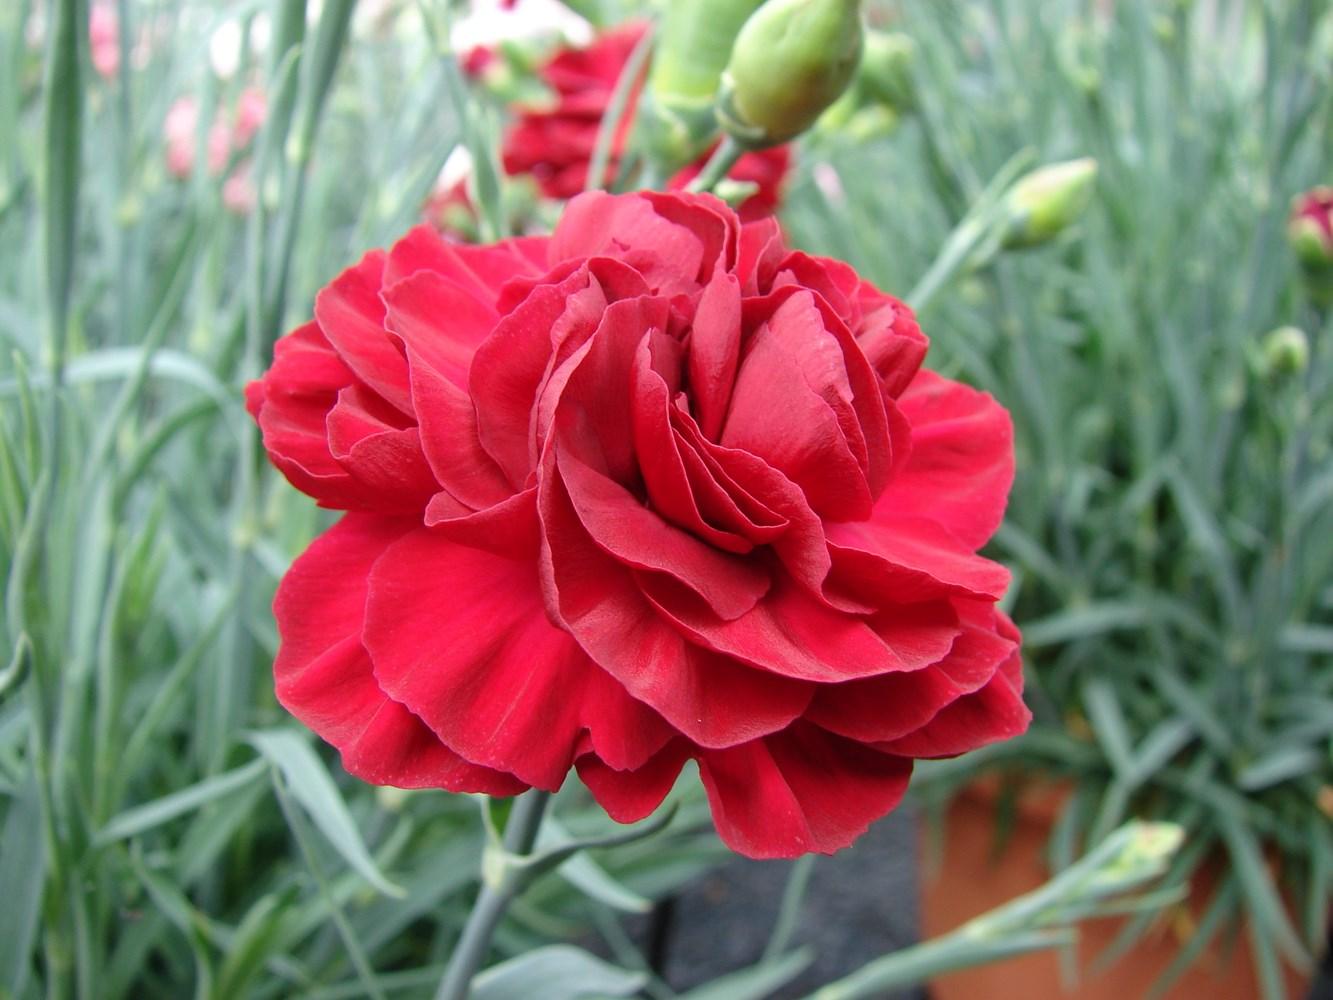 Website/Plants/1449111994/Images/Gallery/d_passion_07.0.jpg